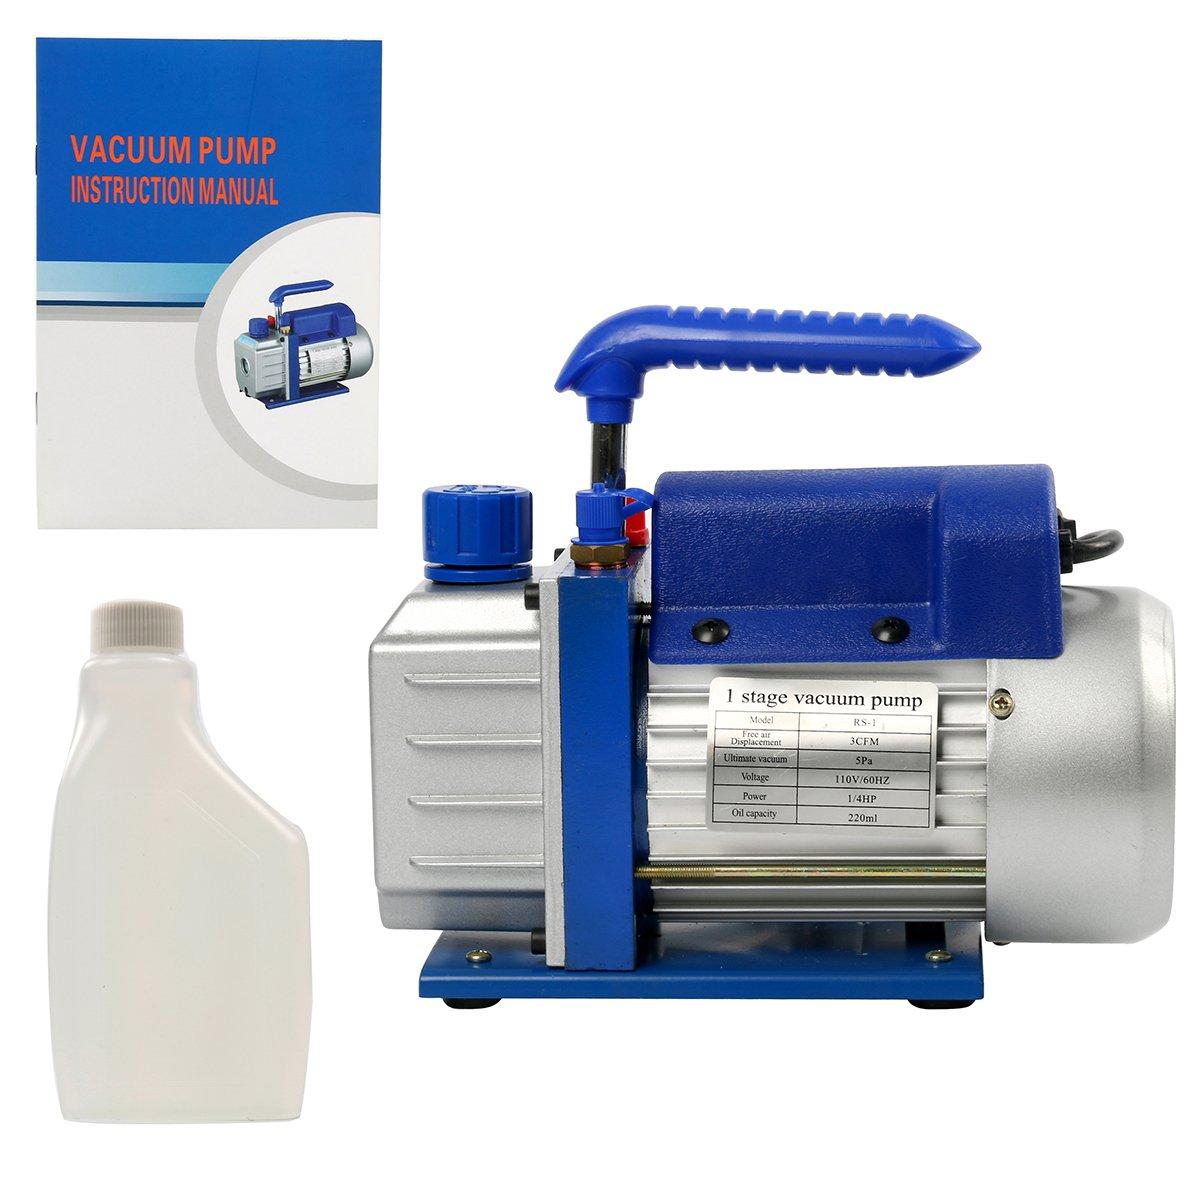 YaeTek 1/4HP 3 CFM Vacuum Pump - 110V Single Stage 3CFM Rotary Vane Vacuum Pump Refrigerant Air Conditioning Yaemart Corporation